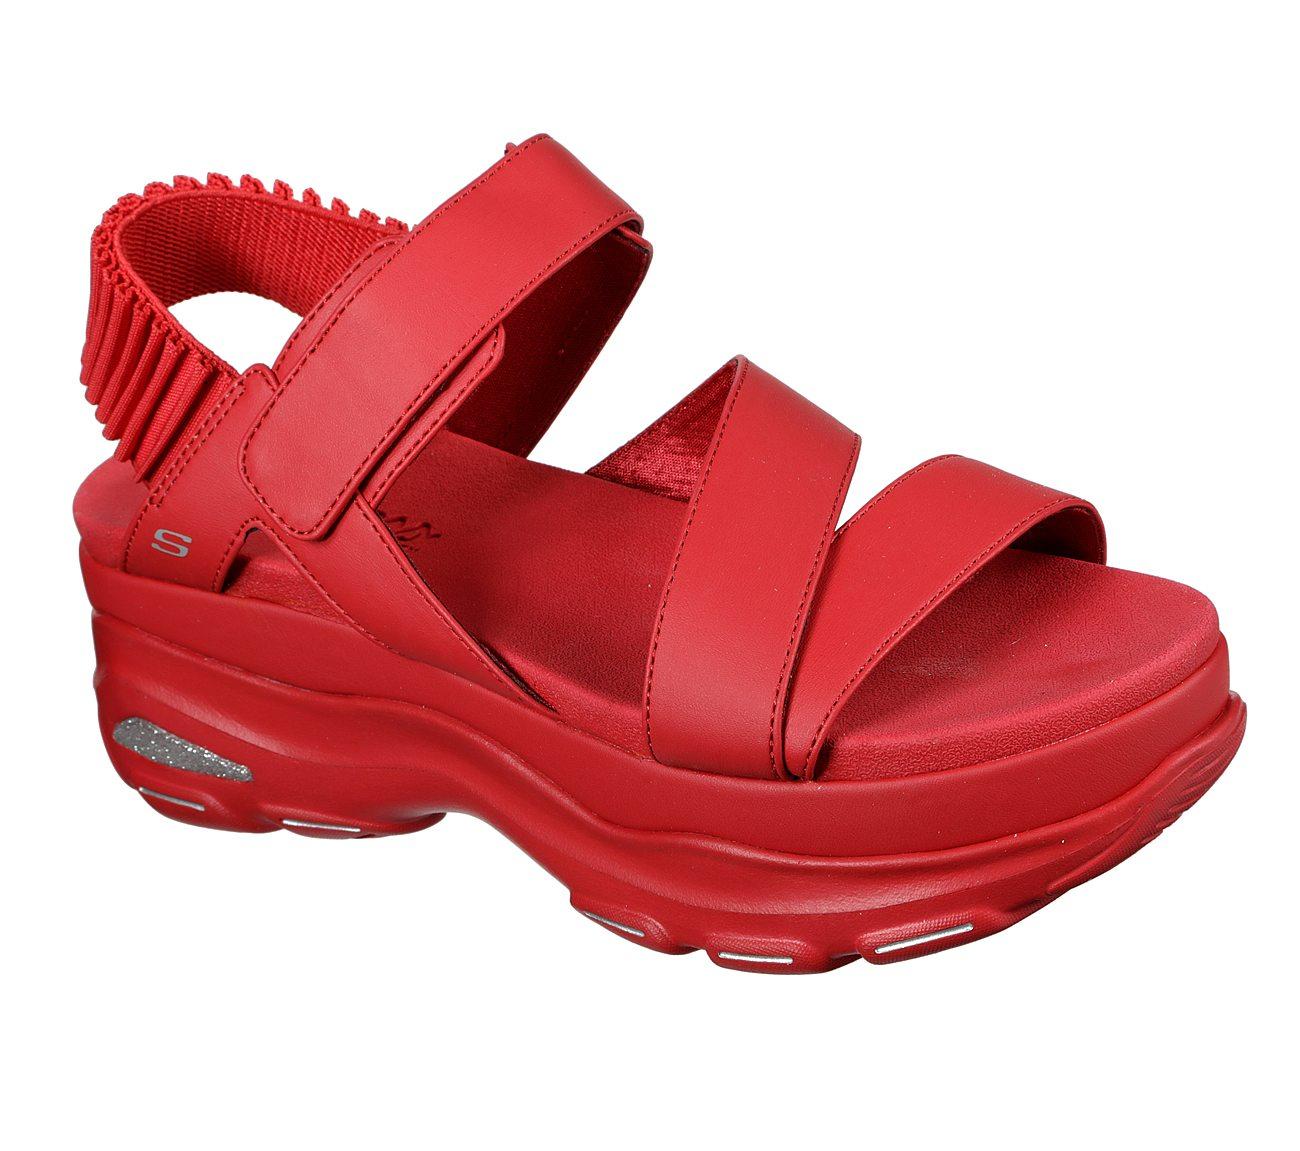 SKECHERS Cloud Ultra SKECHERS Cali Shoes